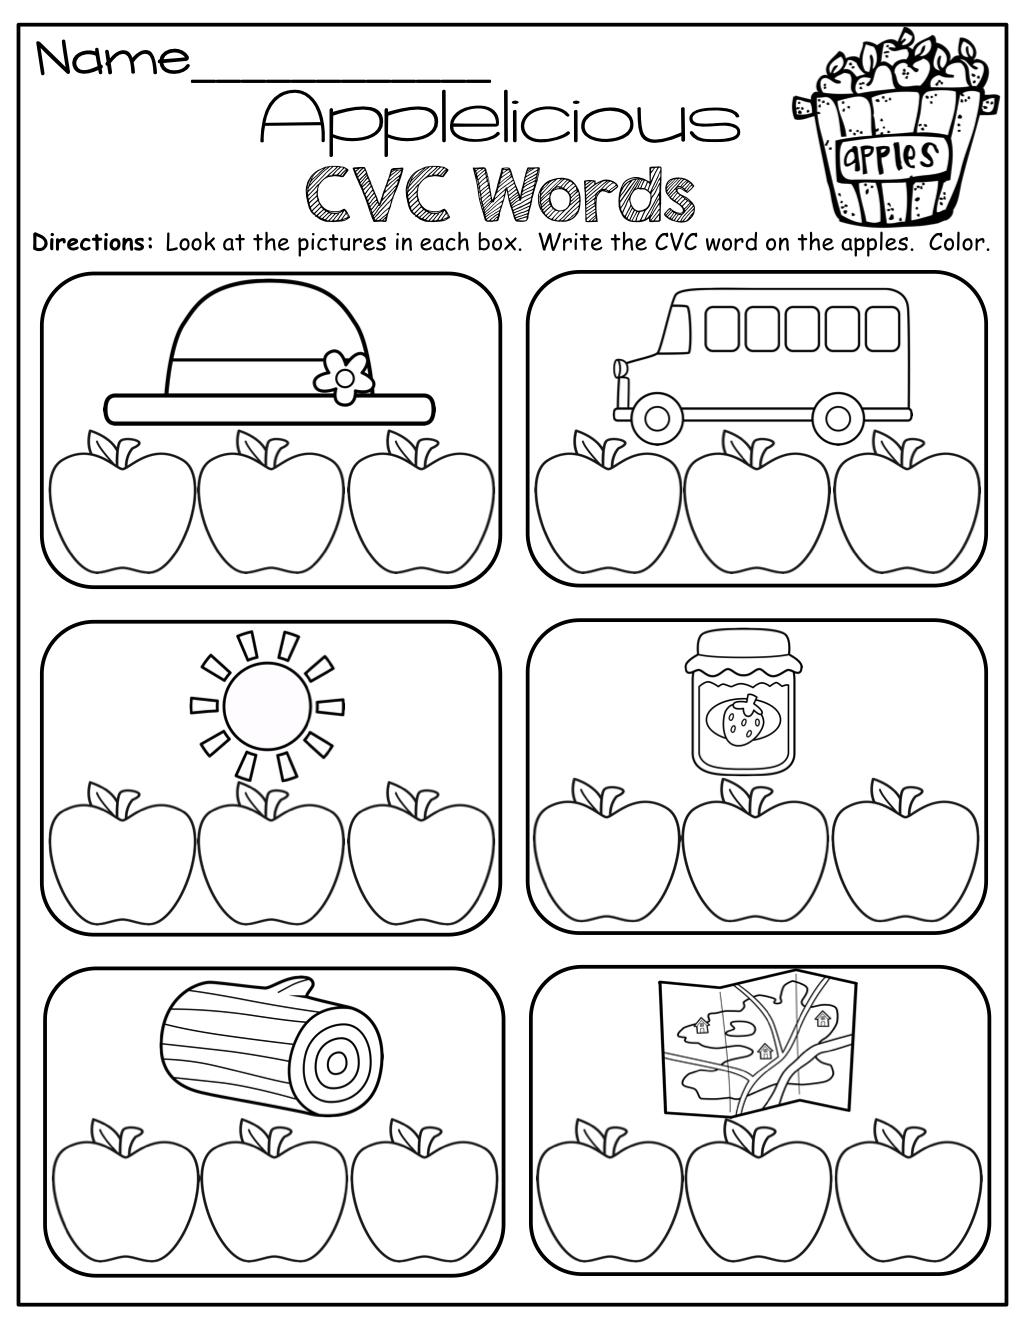 Make A Cvc Word Sound By Sound Language Arts Kindergarten Cvc Words Kindergarten Kindergarten Language Arts Kindergarten Language [ 1325 x 1024 Pixel ]